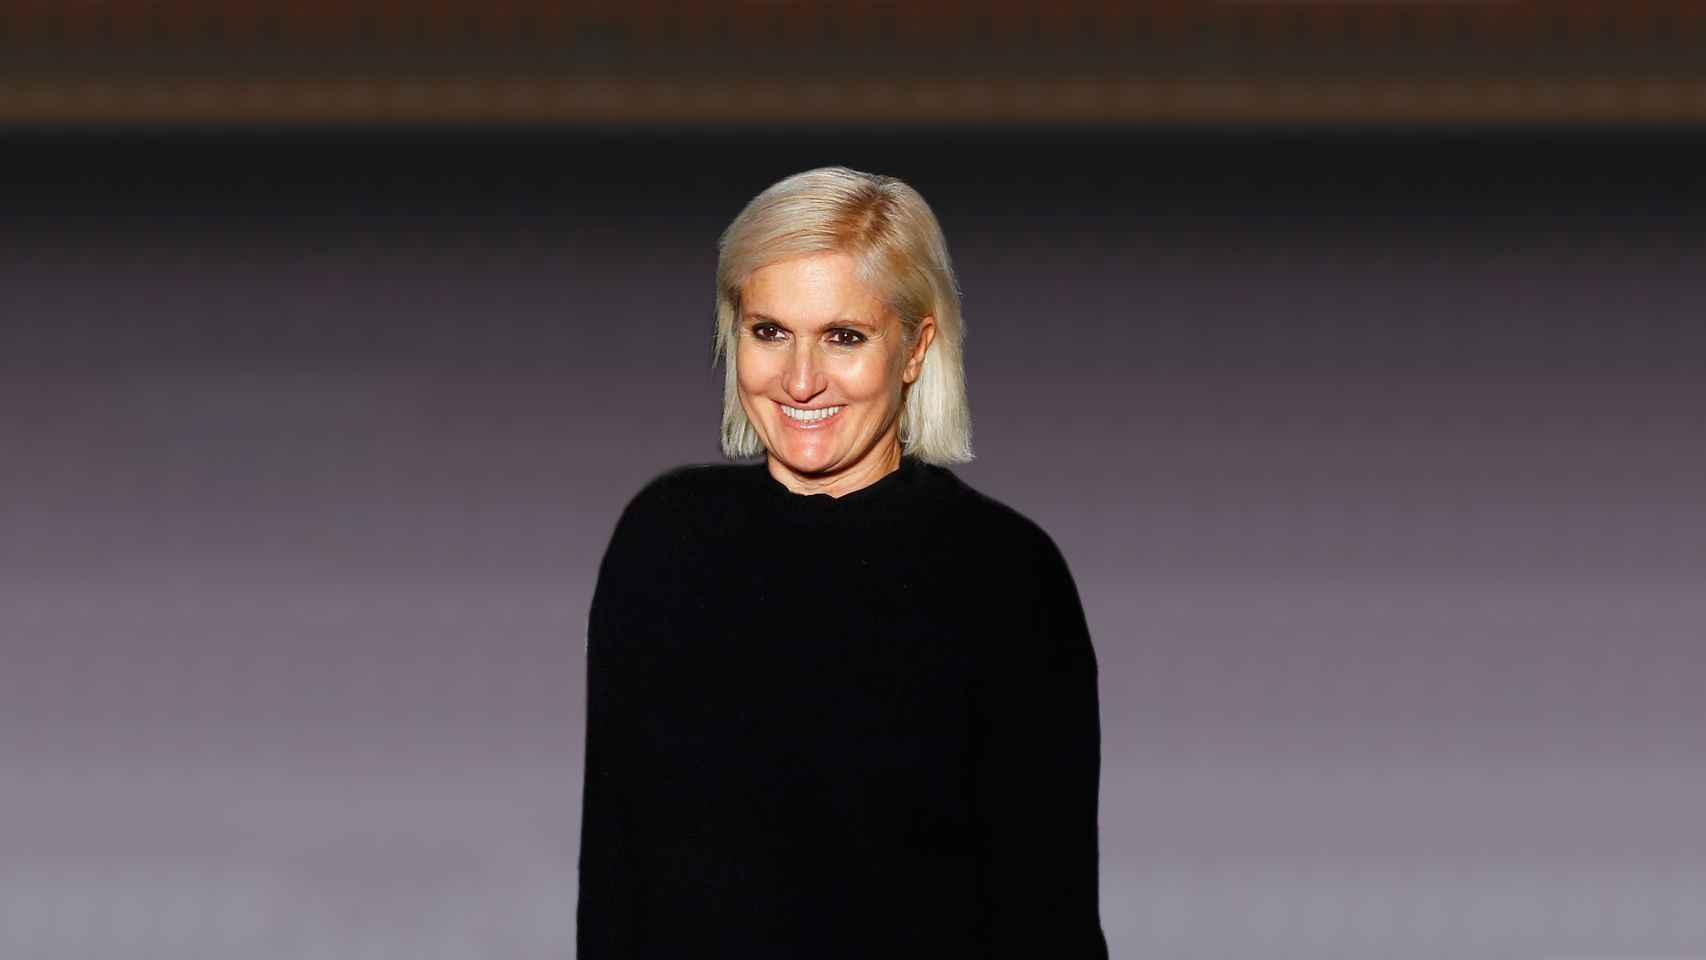 Maria Grazia Chiuri, futura diseñadora de Dior.